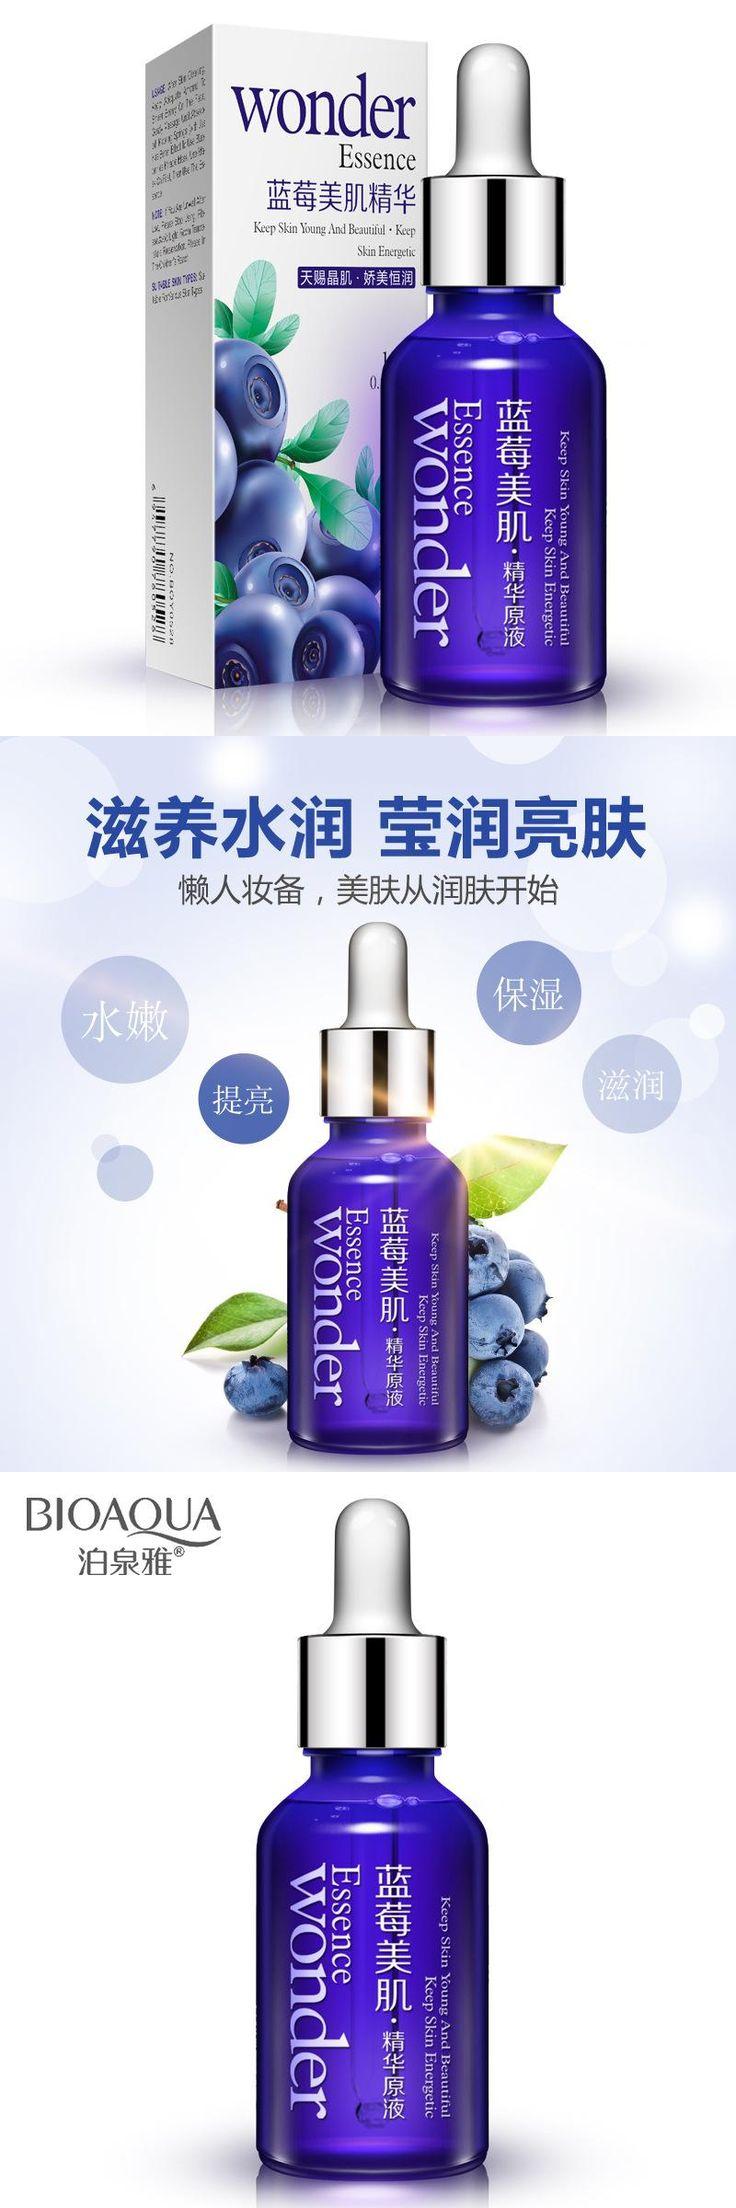 [Visit to Buy] New BIOAQUA Face Care Blueberry Hyaluronic Acid Liquid Anti Wrinkle Anti Aging Pure Essence Whitening Moisturizing Day Cream Oil #Advertisement